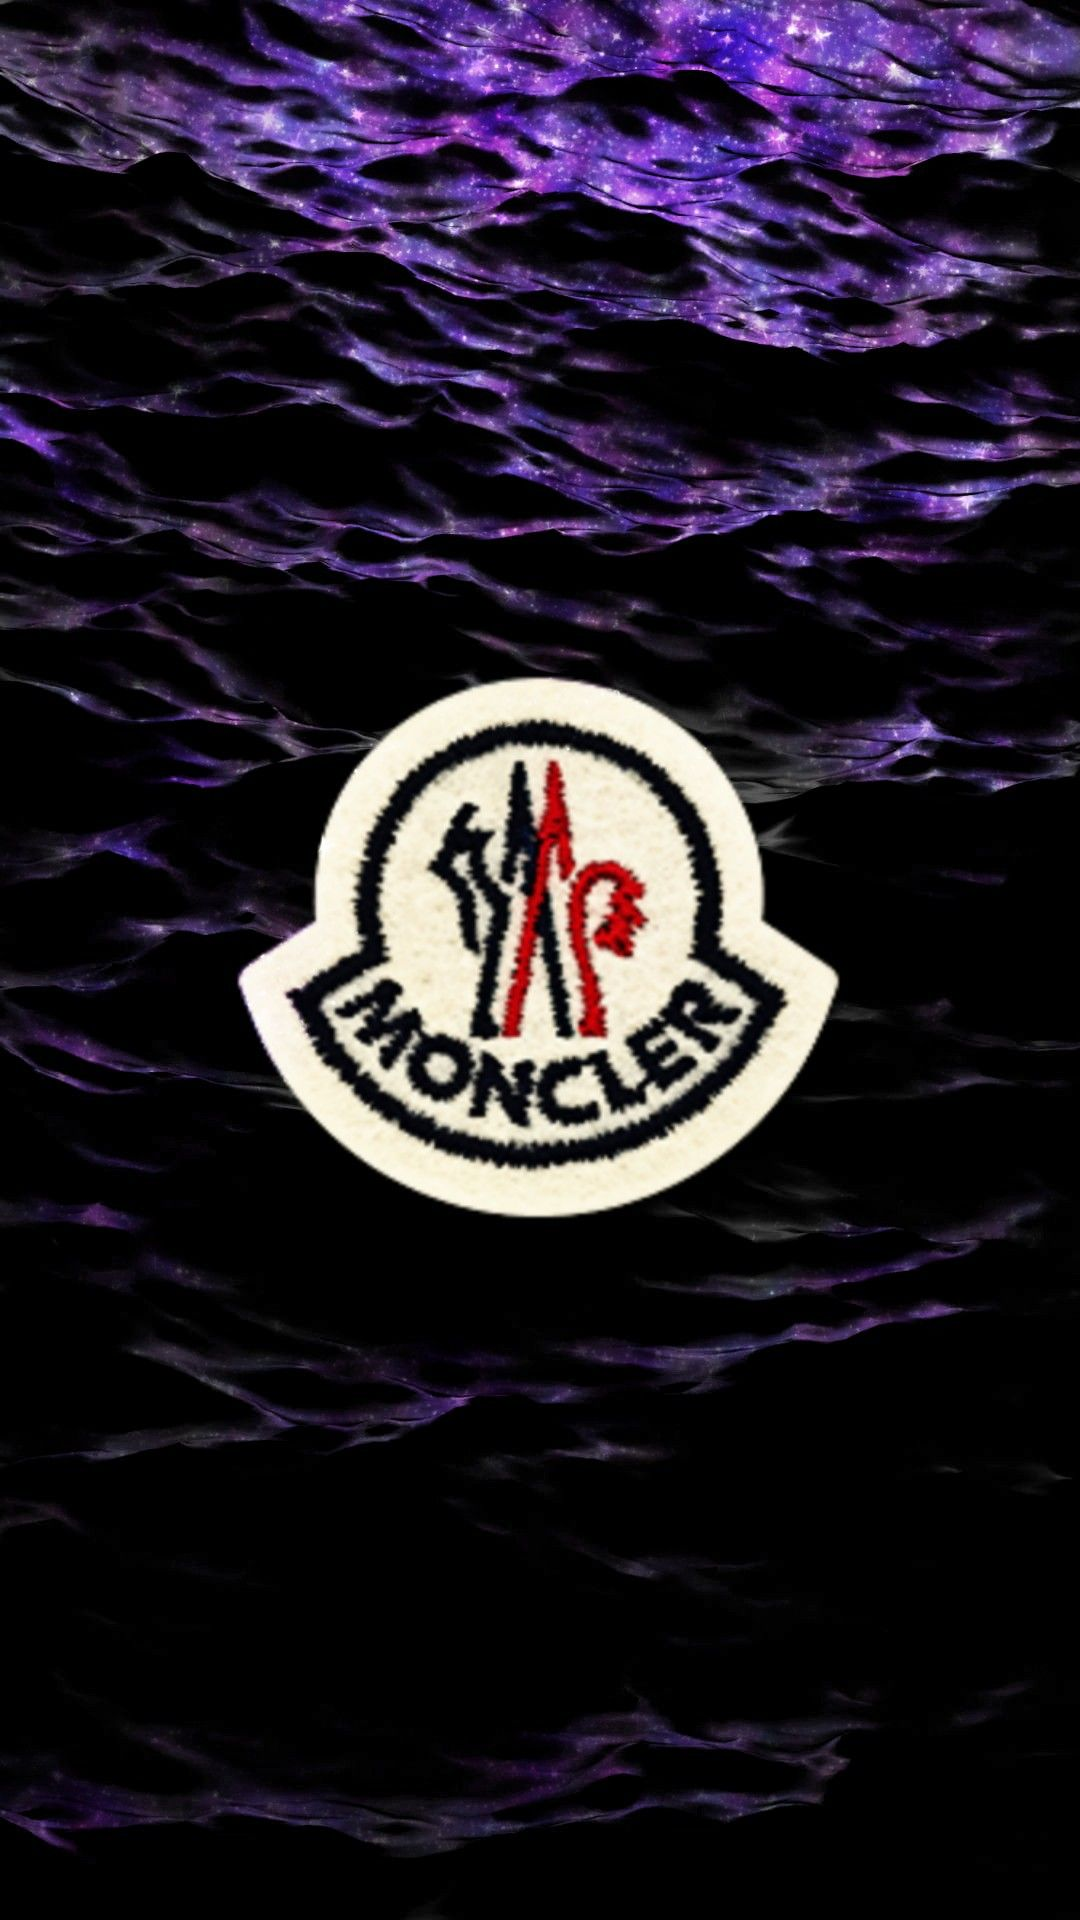 Moncler Wallpaper In 2020 Moncler Art Logo Wallpaper